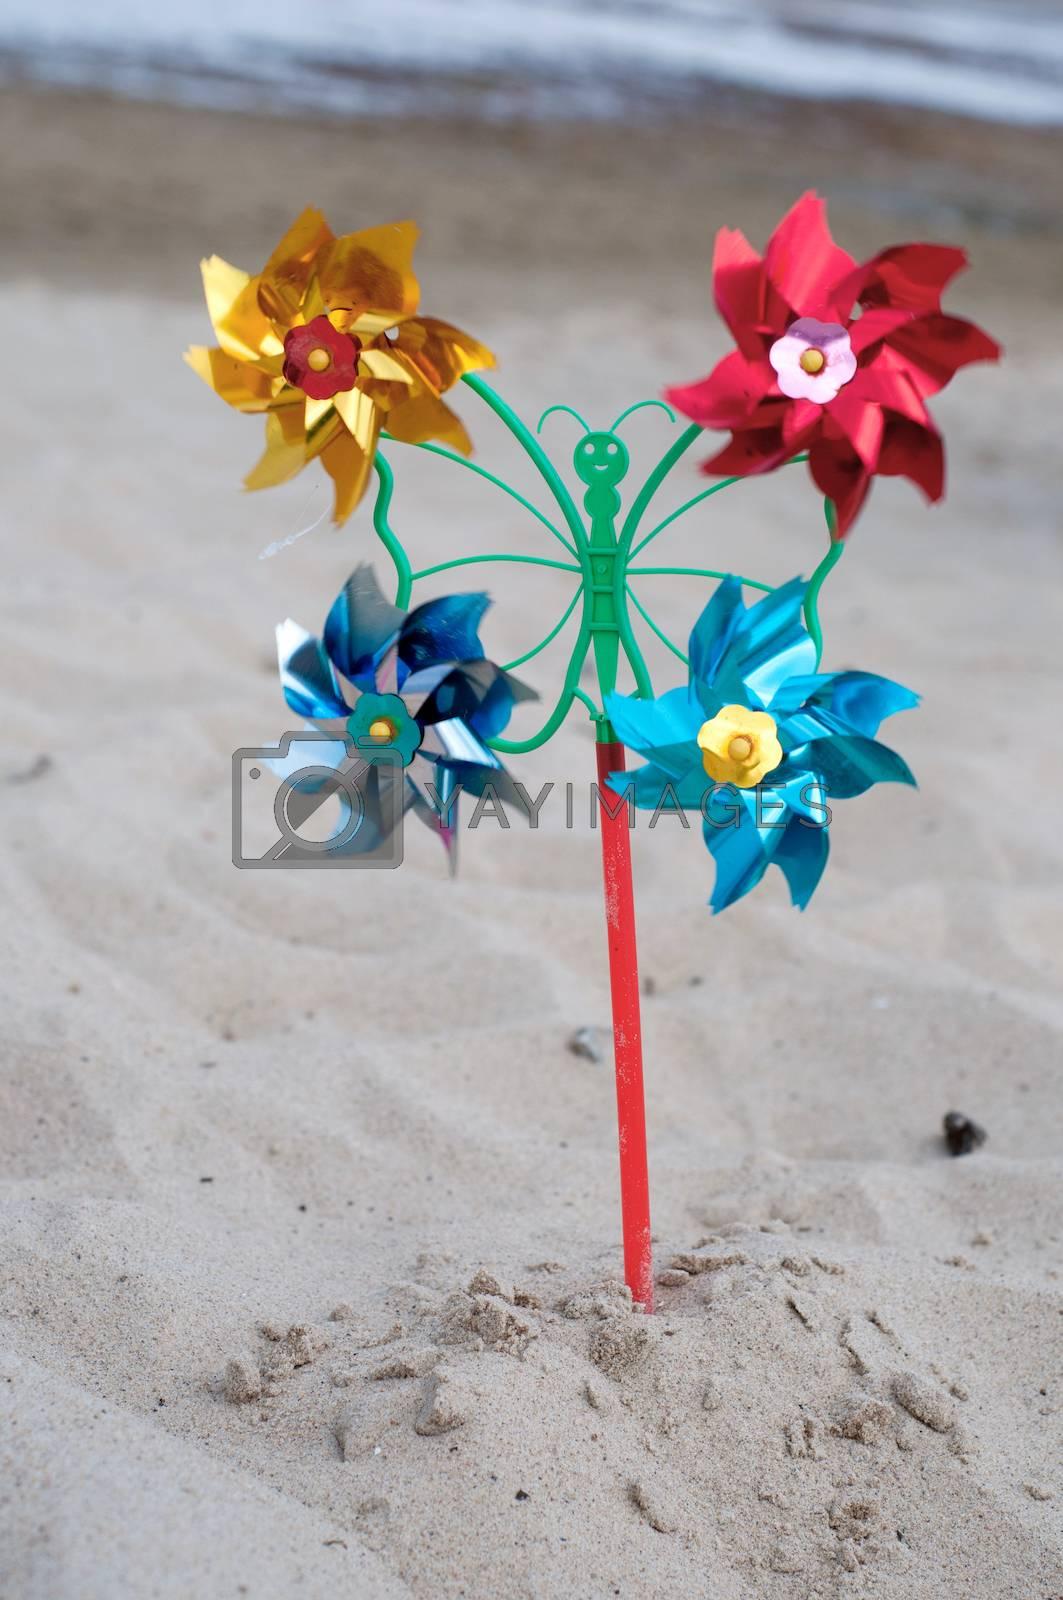 Shot of pinwheel toy on the sandy background